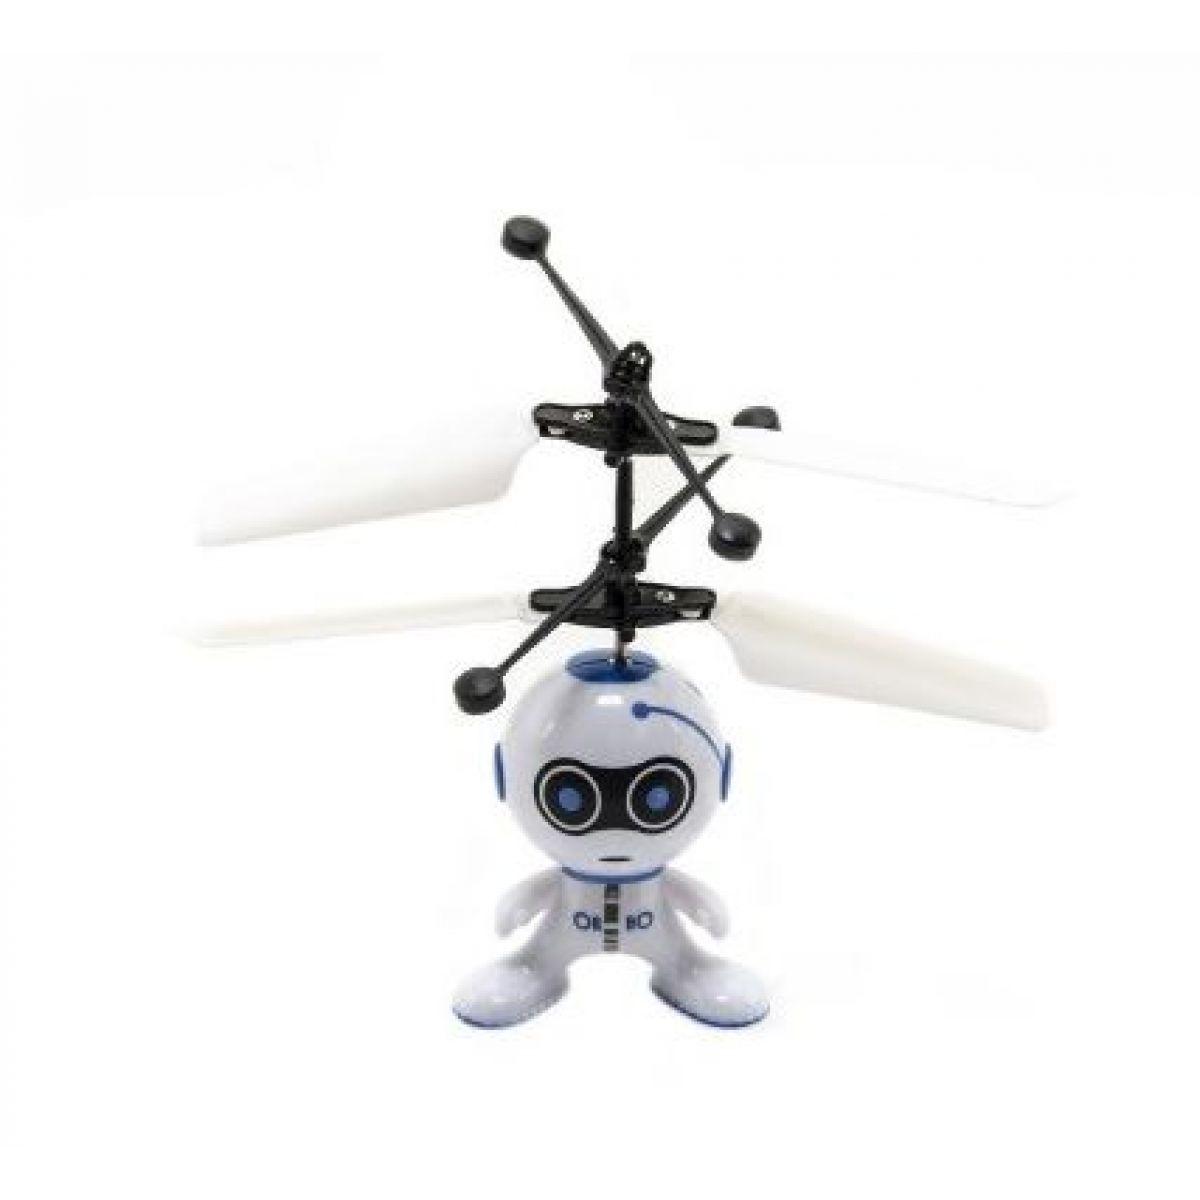 Vrtuľníkový robot lietajúce s USB káblom modrý